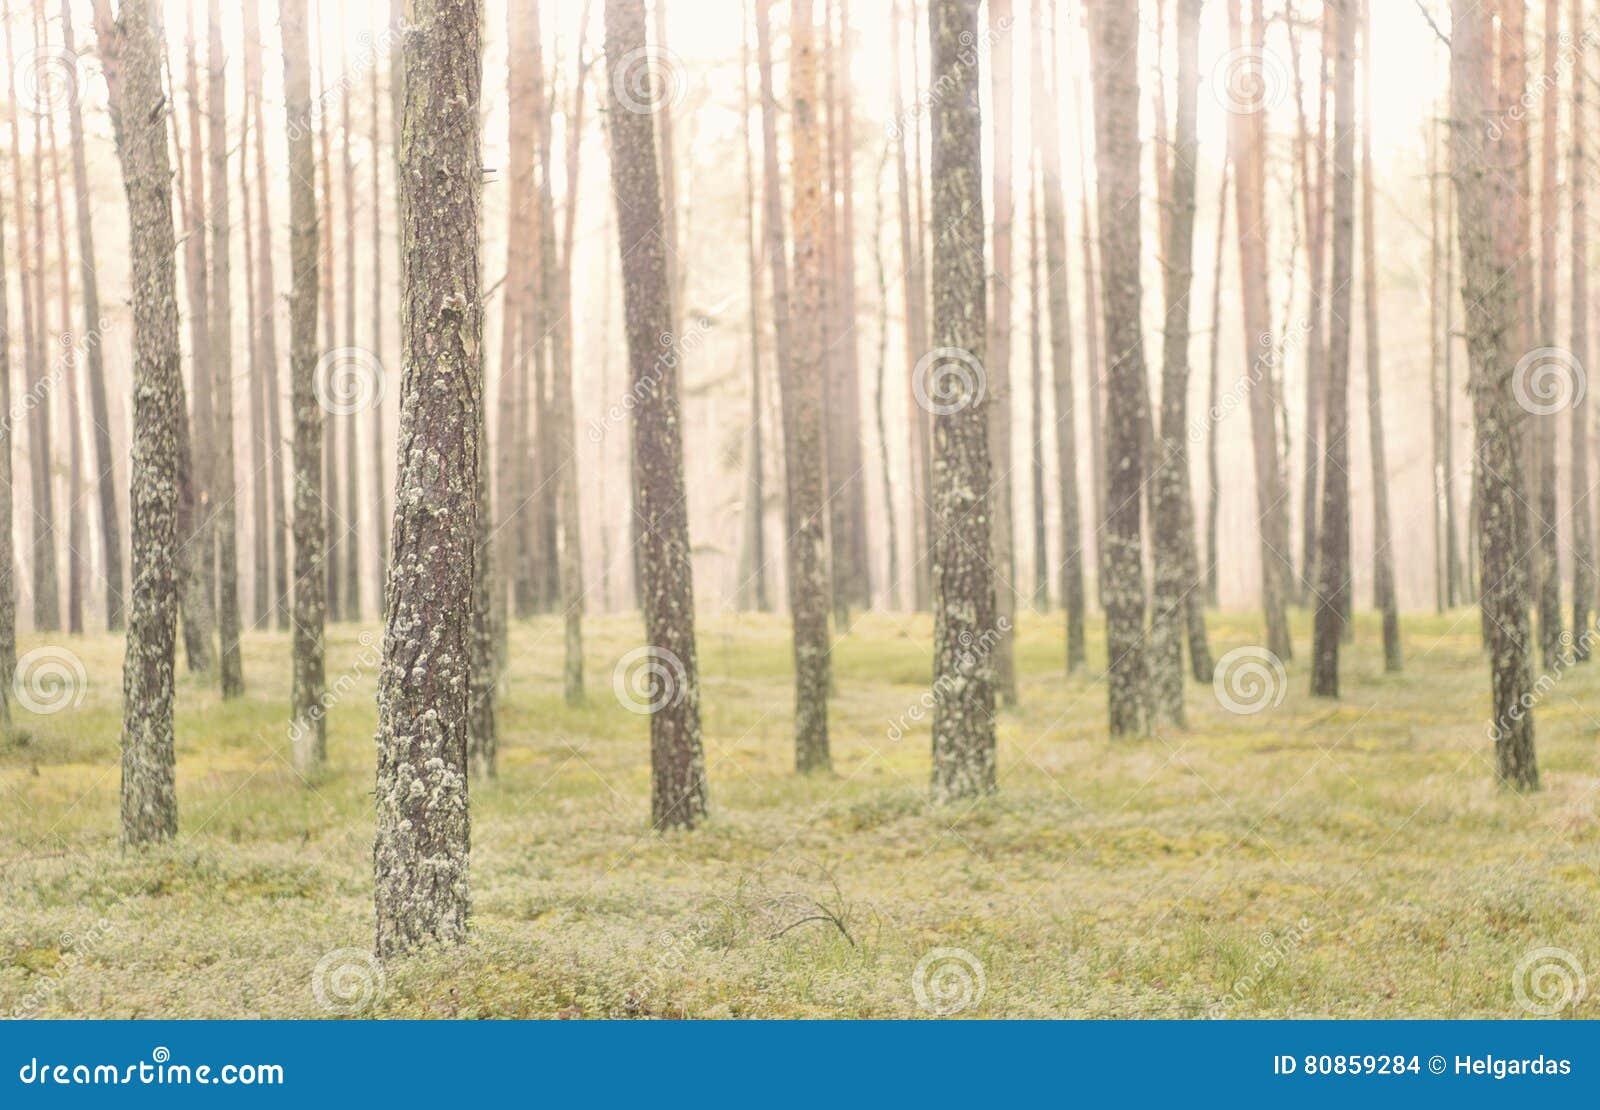 Kieferstämme im Wald